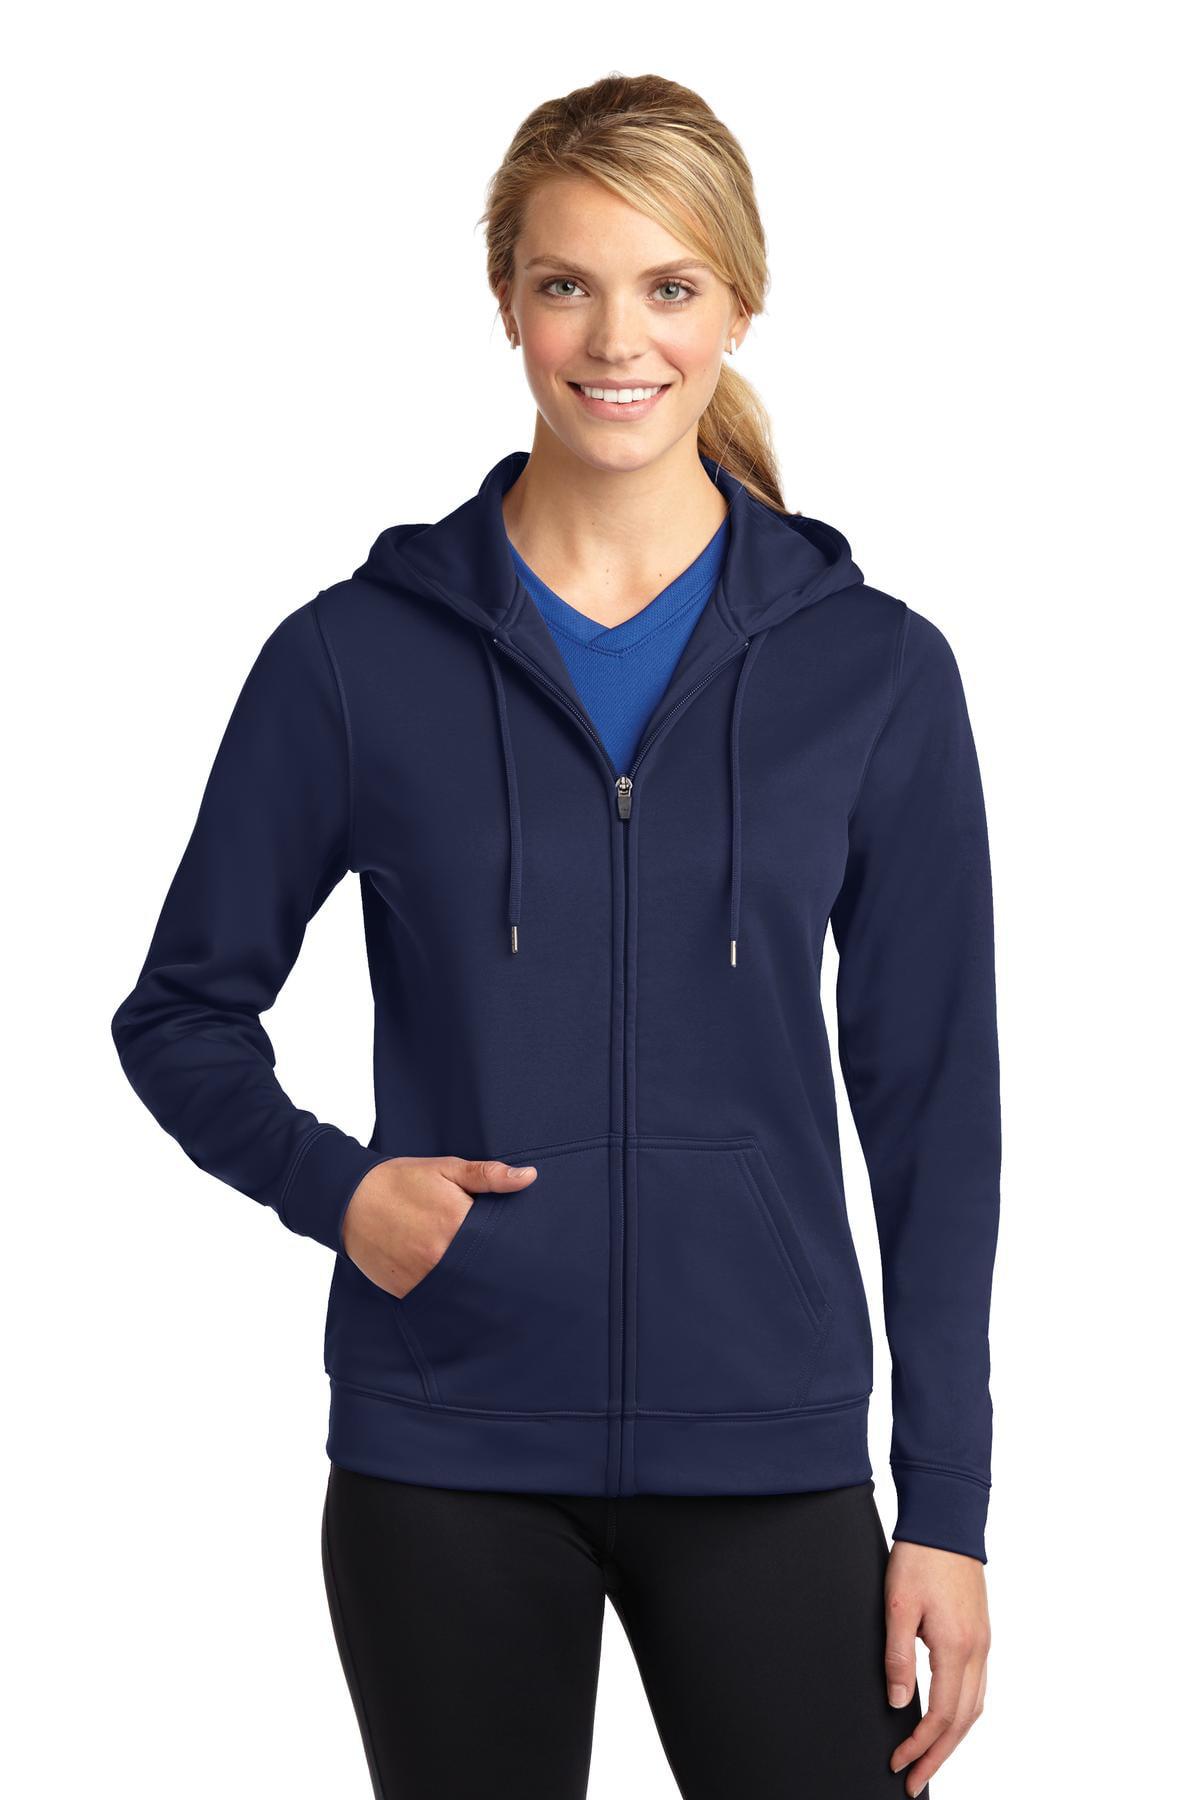 Sport-Tek Ladies Sport-Wick Fleece Full-Zip Hooded Jacket